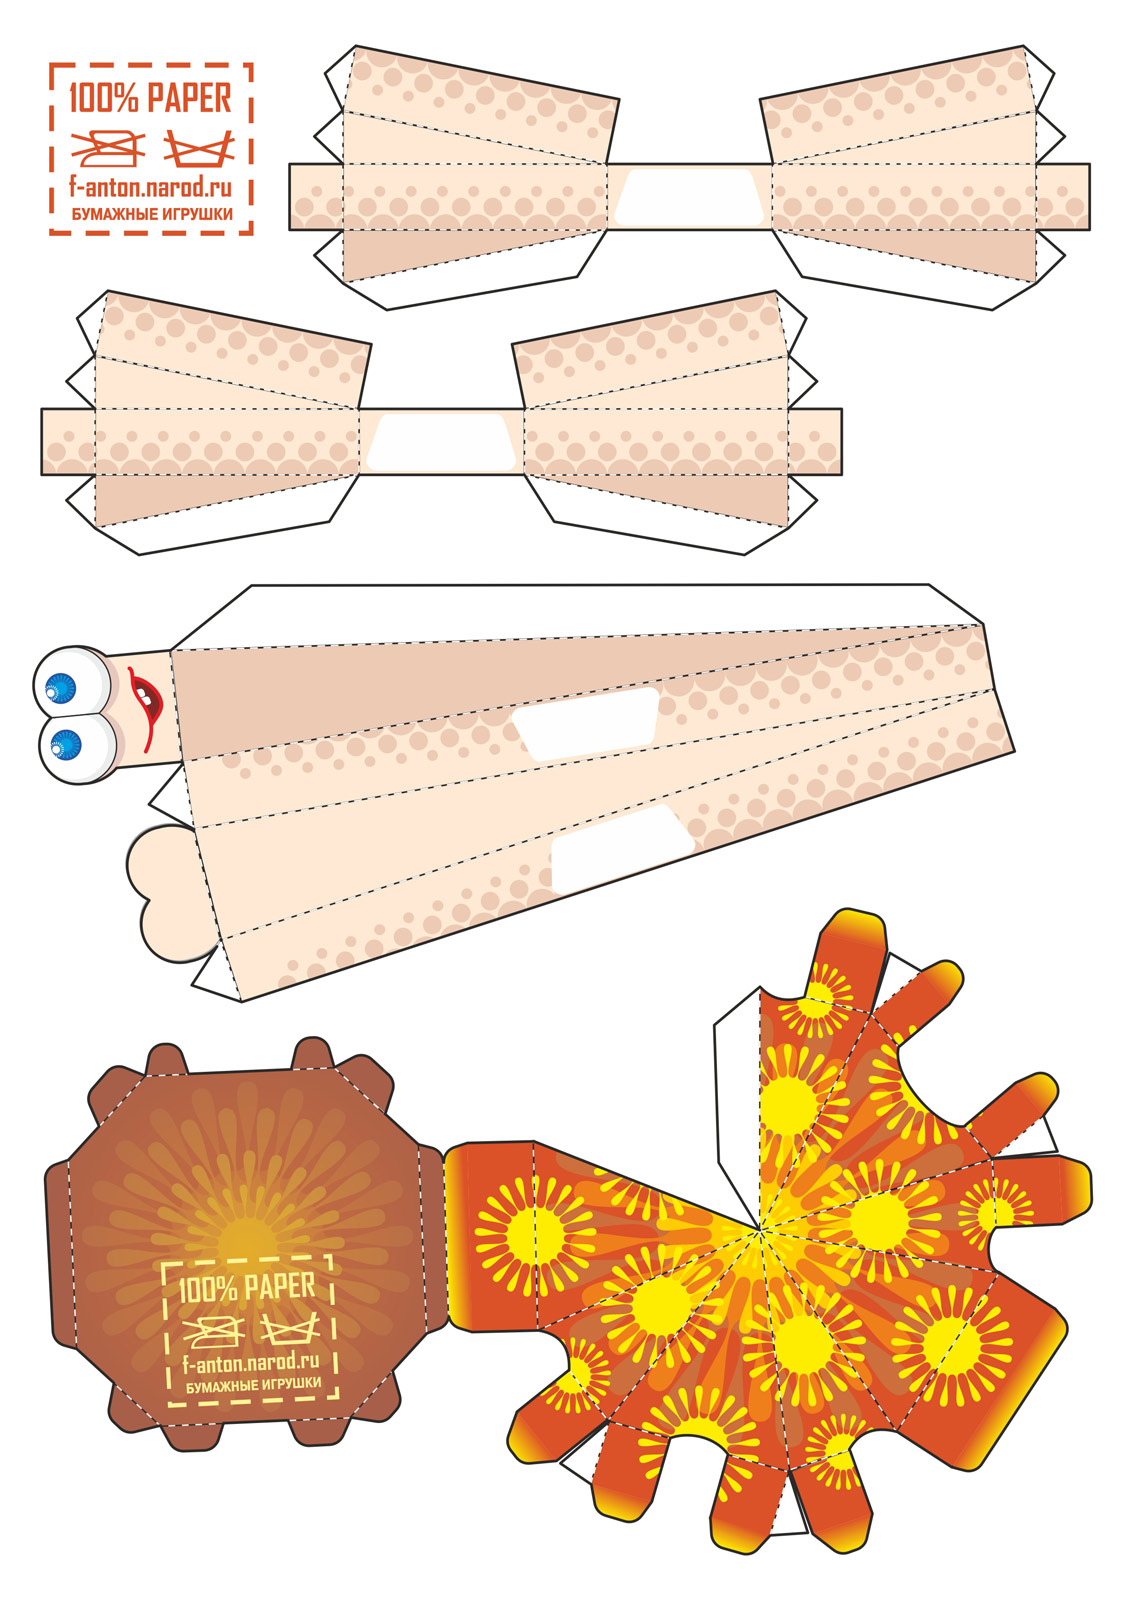 Made in Paperland: Черепаха из бумаги